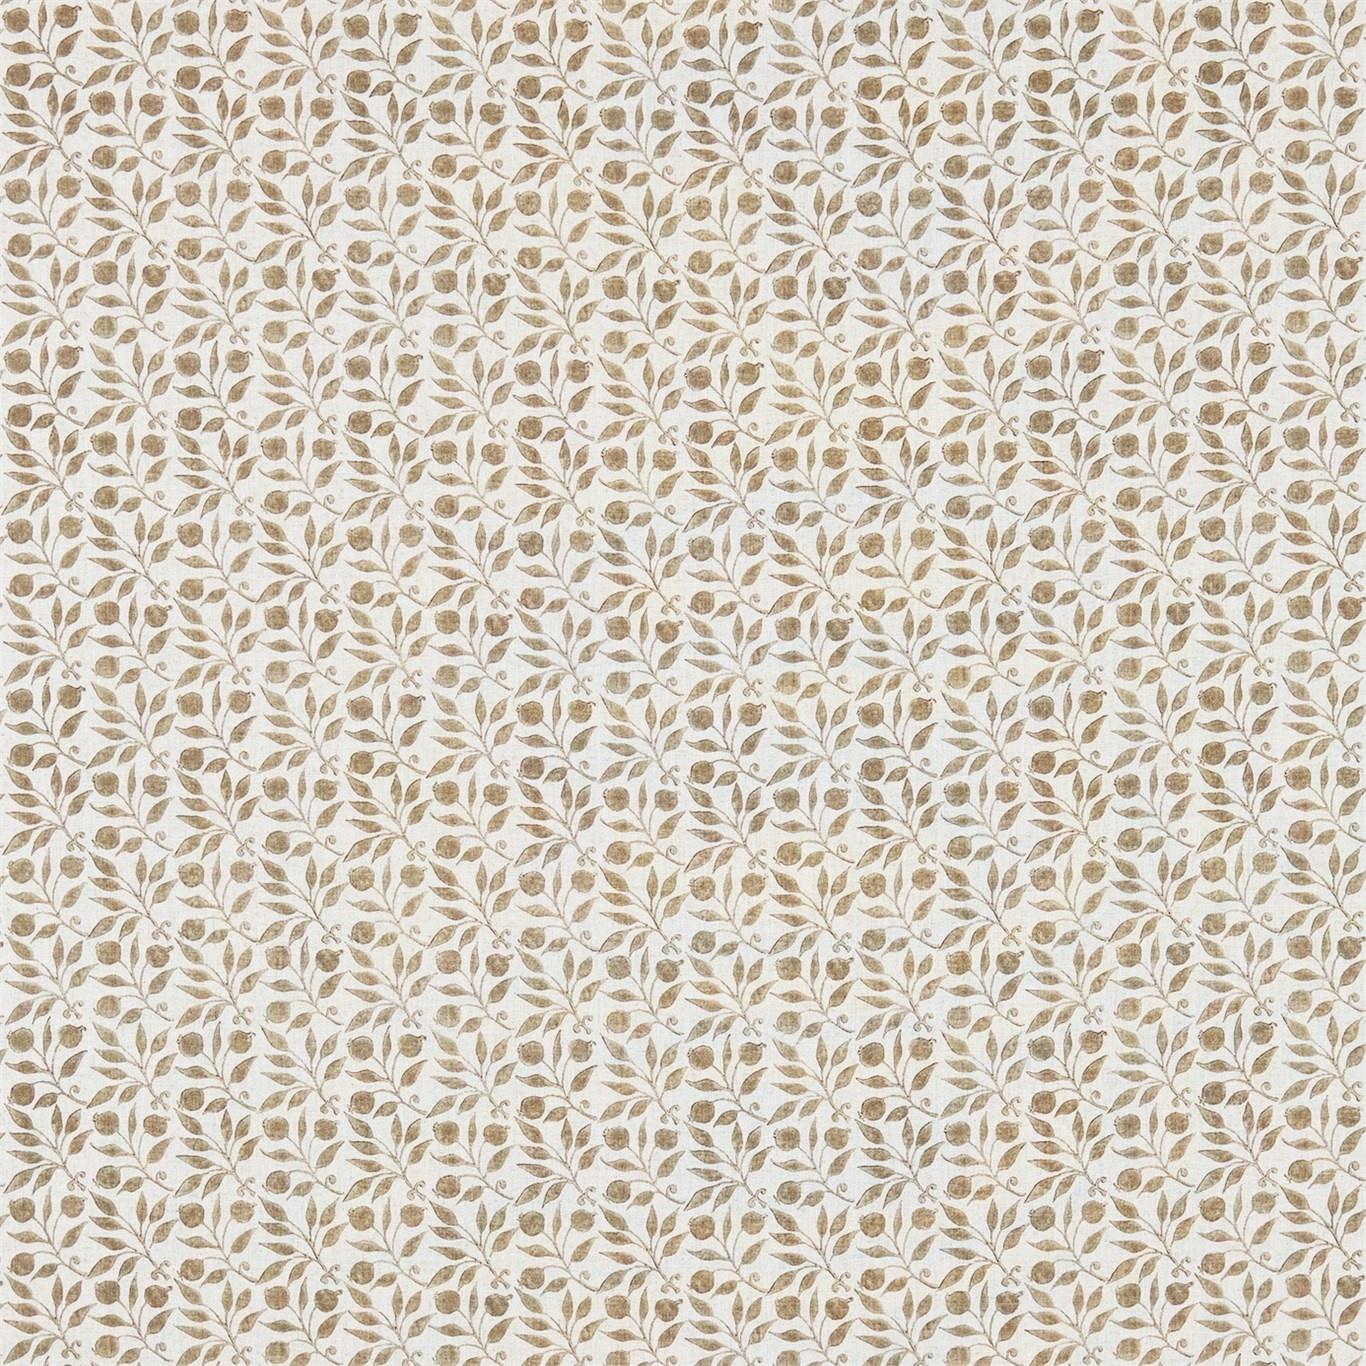 Image of Morris & Co Rosehip Linen/Ecru Curtain Fabric 224487